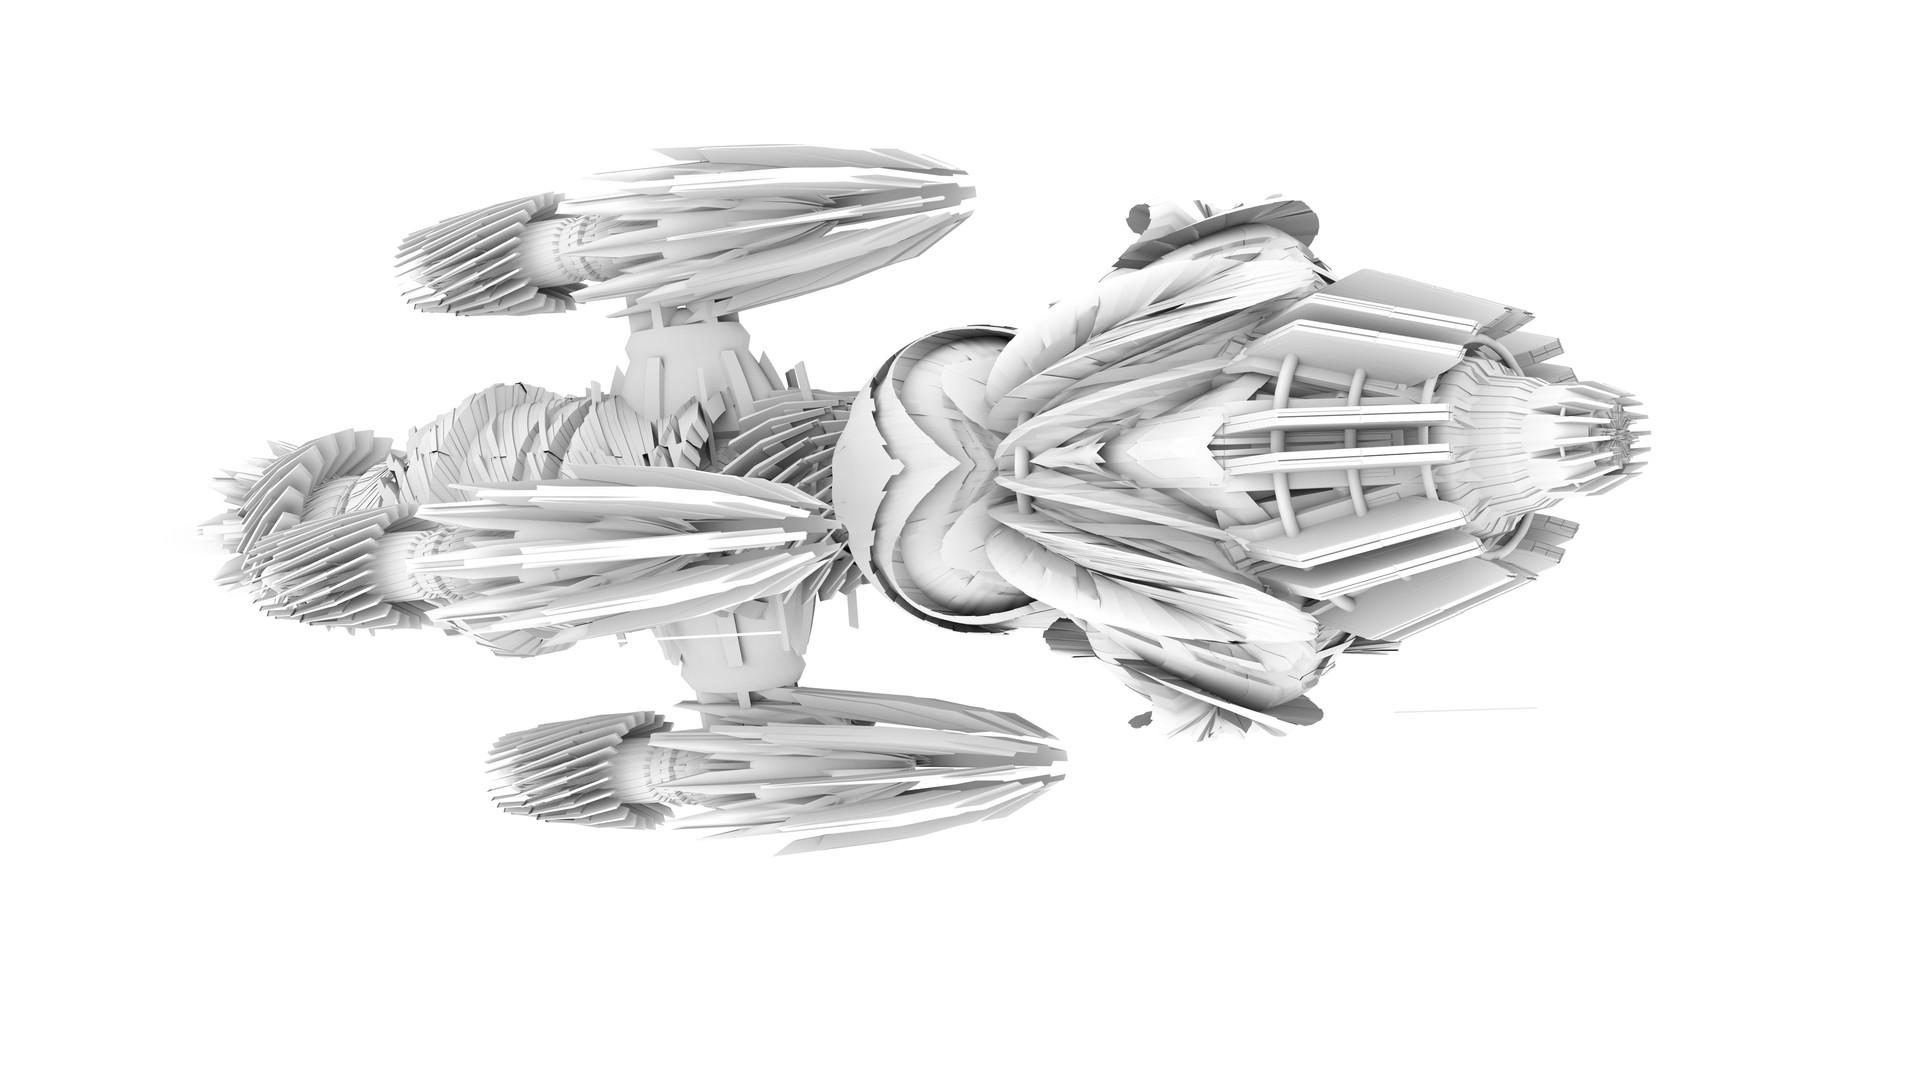 Kresimir jelusic robob3ar 245 140616 starship ao